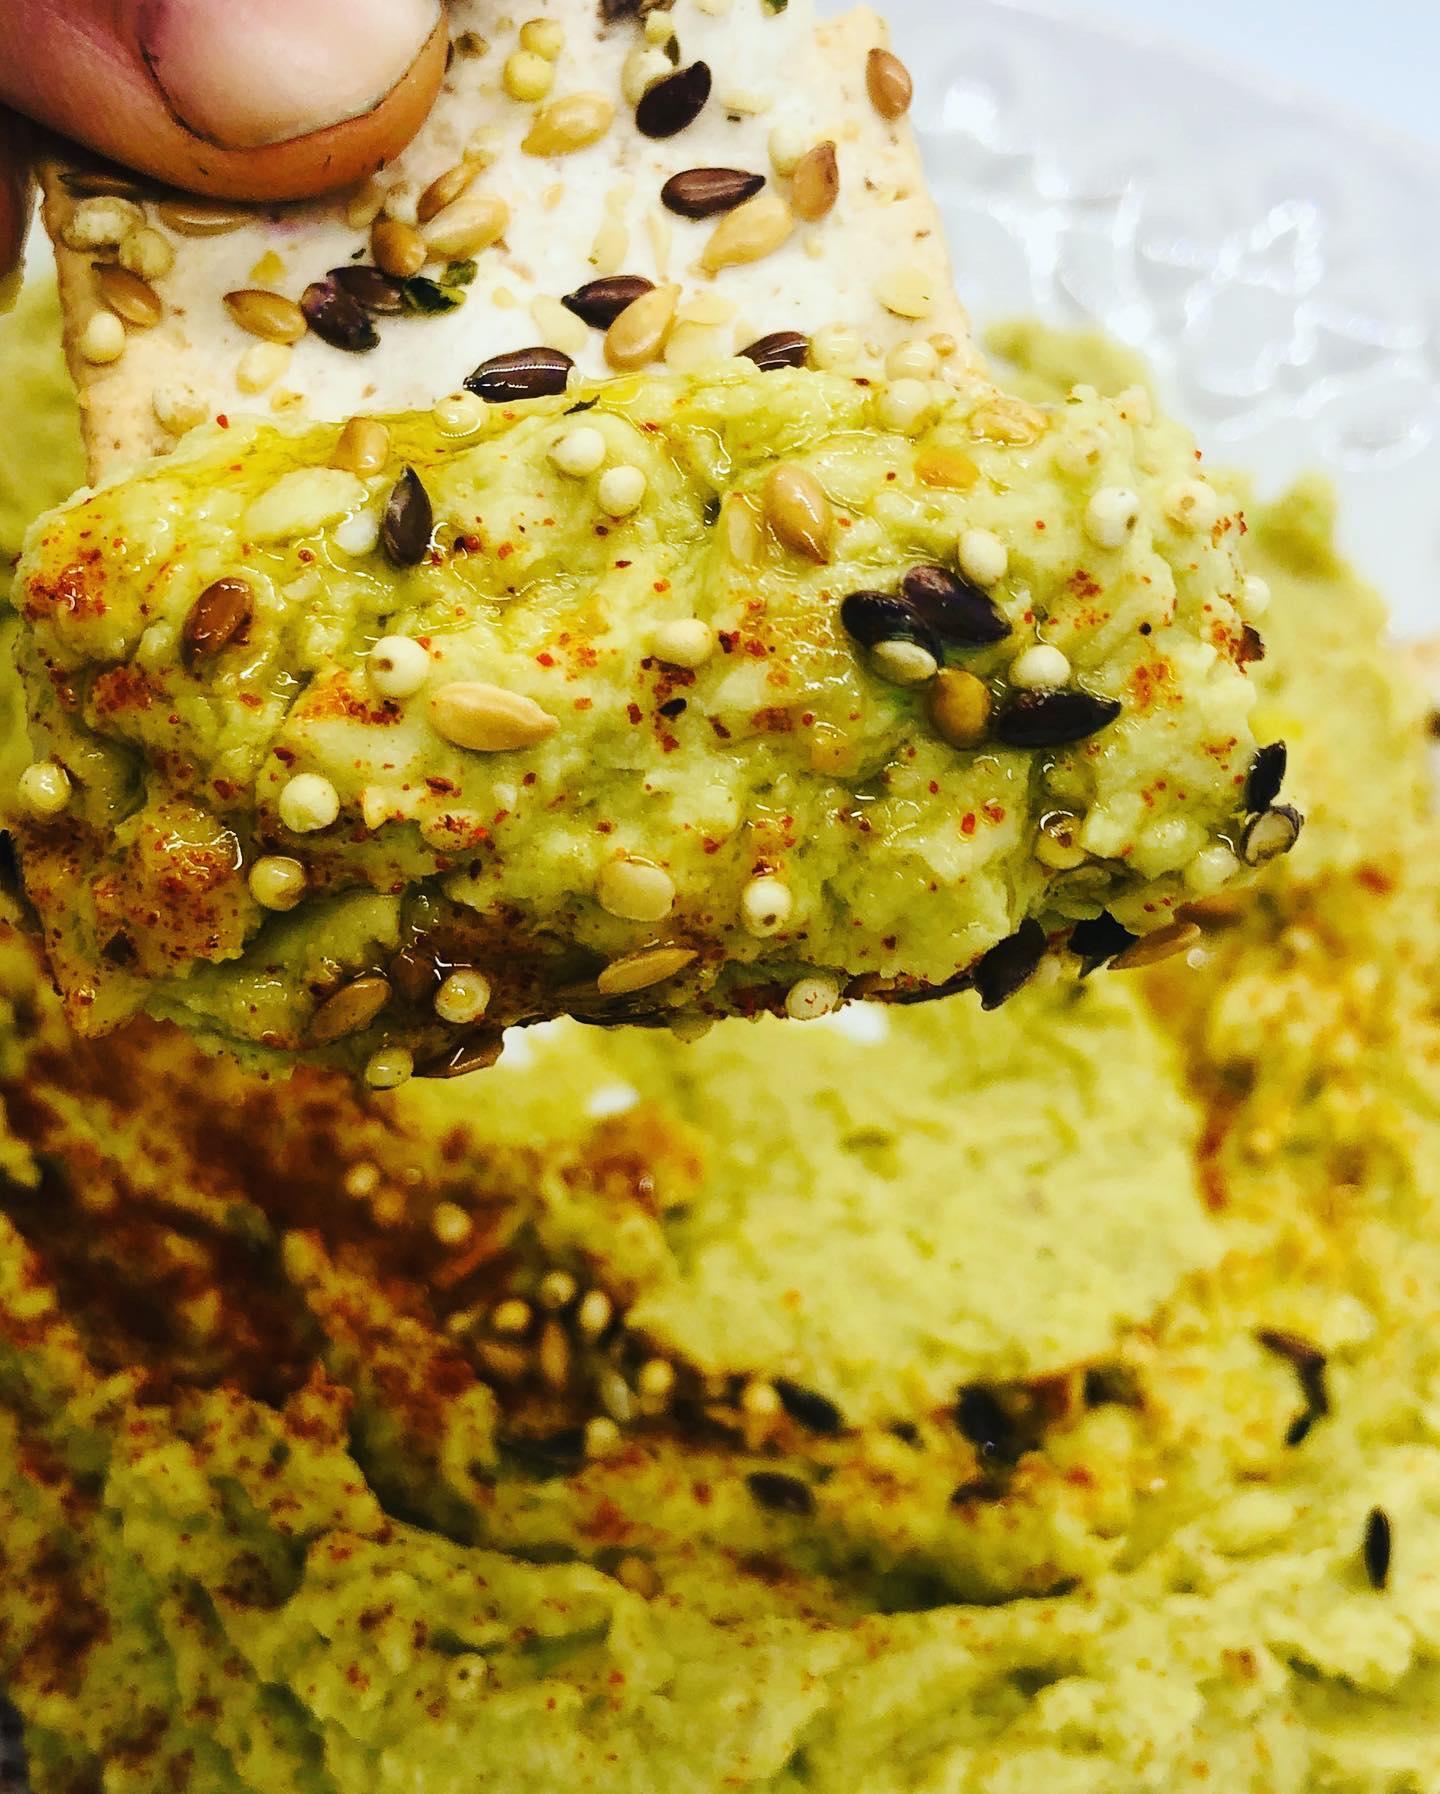 Creamy 5-Minute Broad Bean Hummus